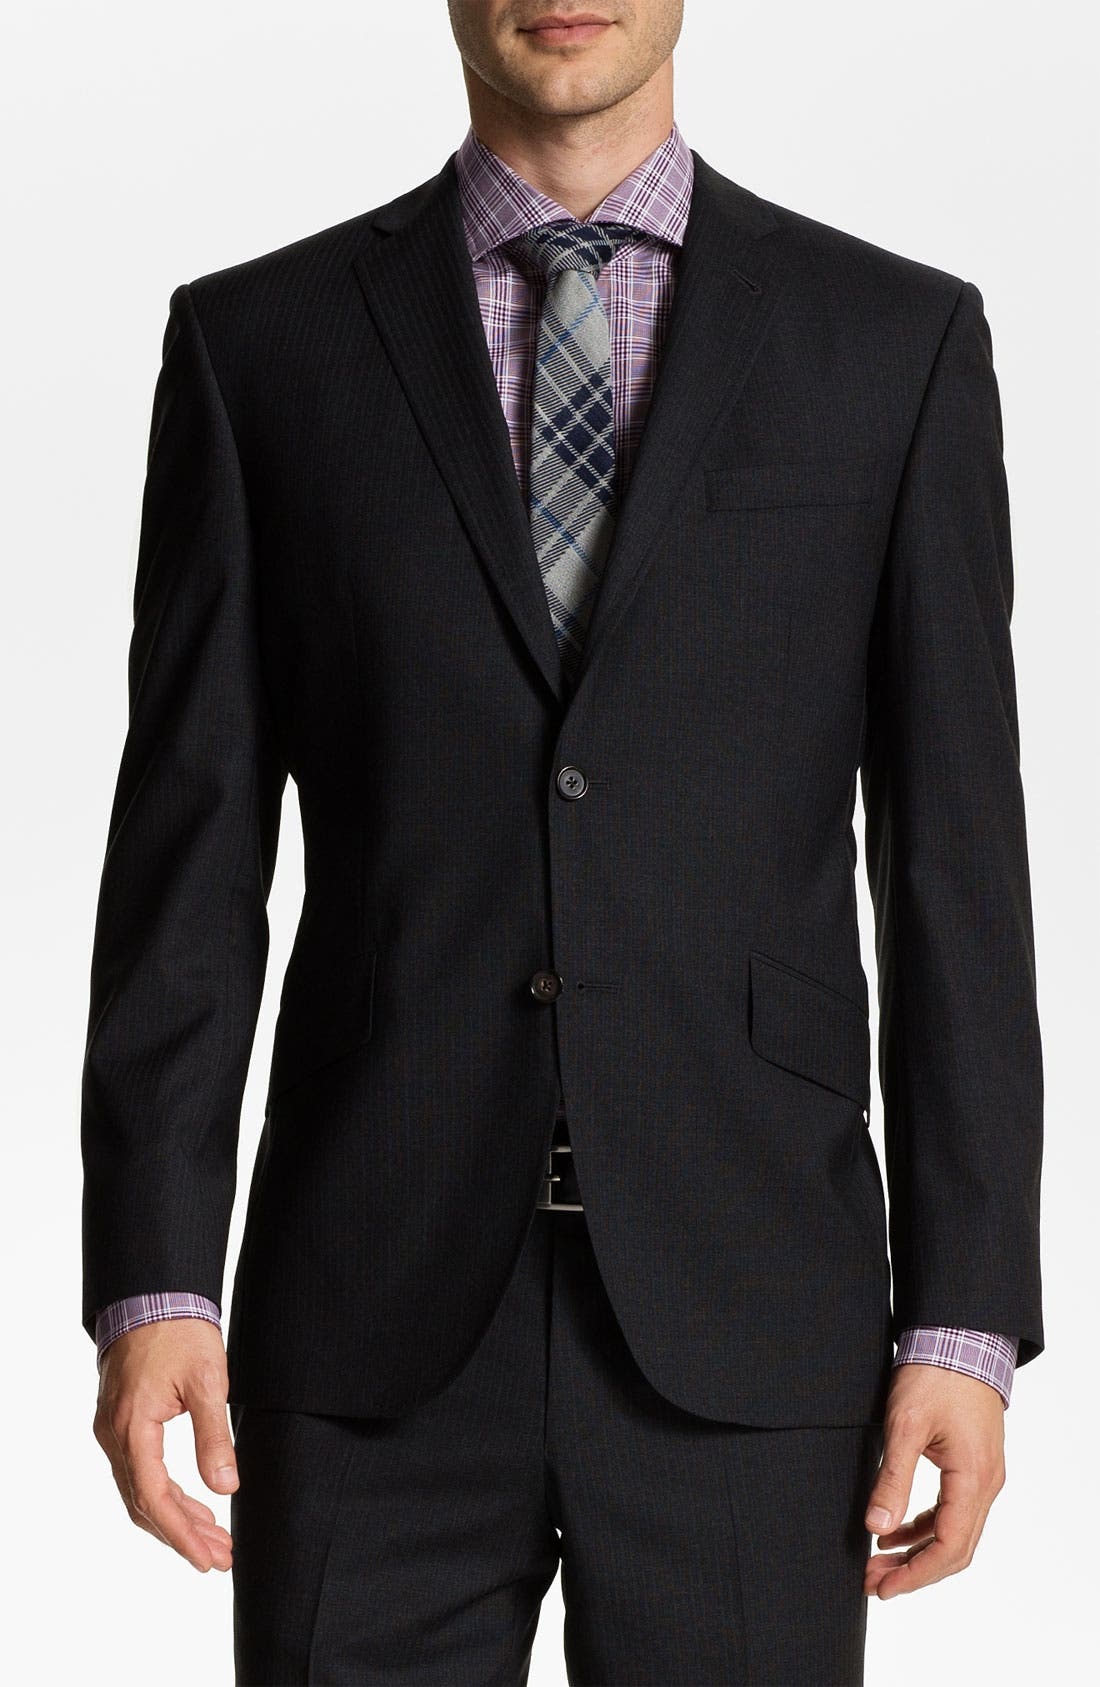 Main Image - Ted Baker London 'Jones' Trim Fit Wool Suit